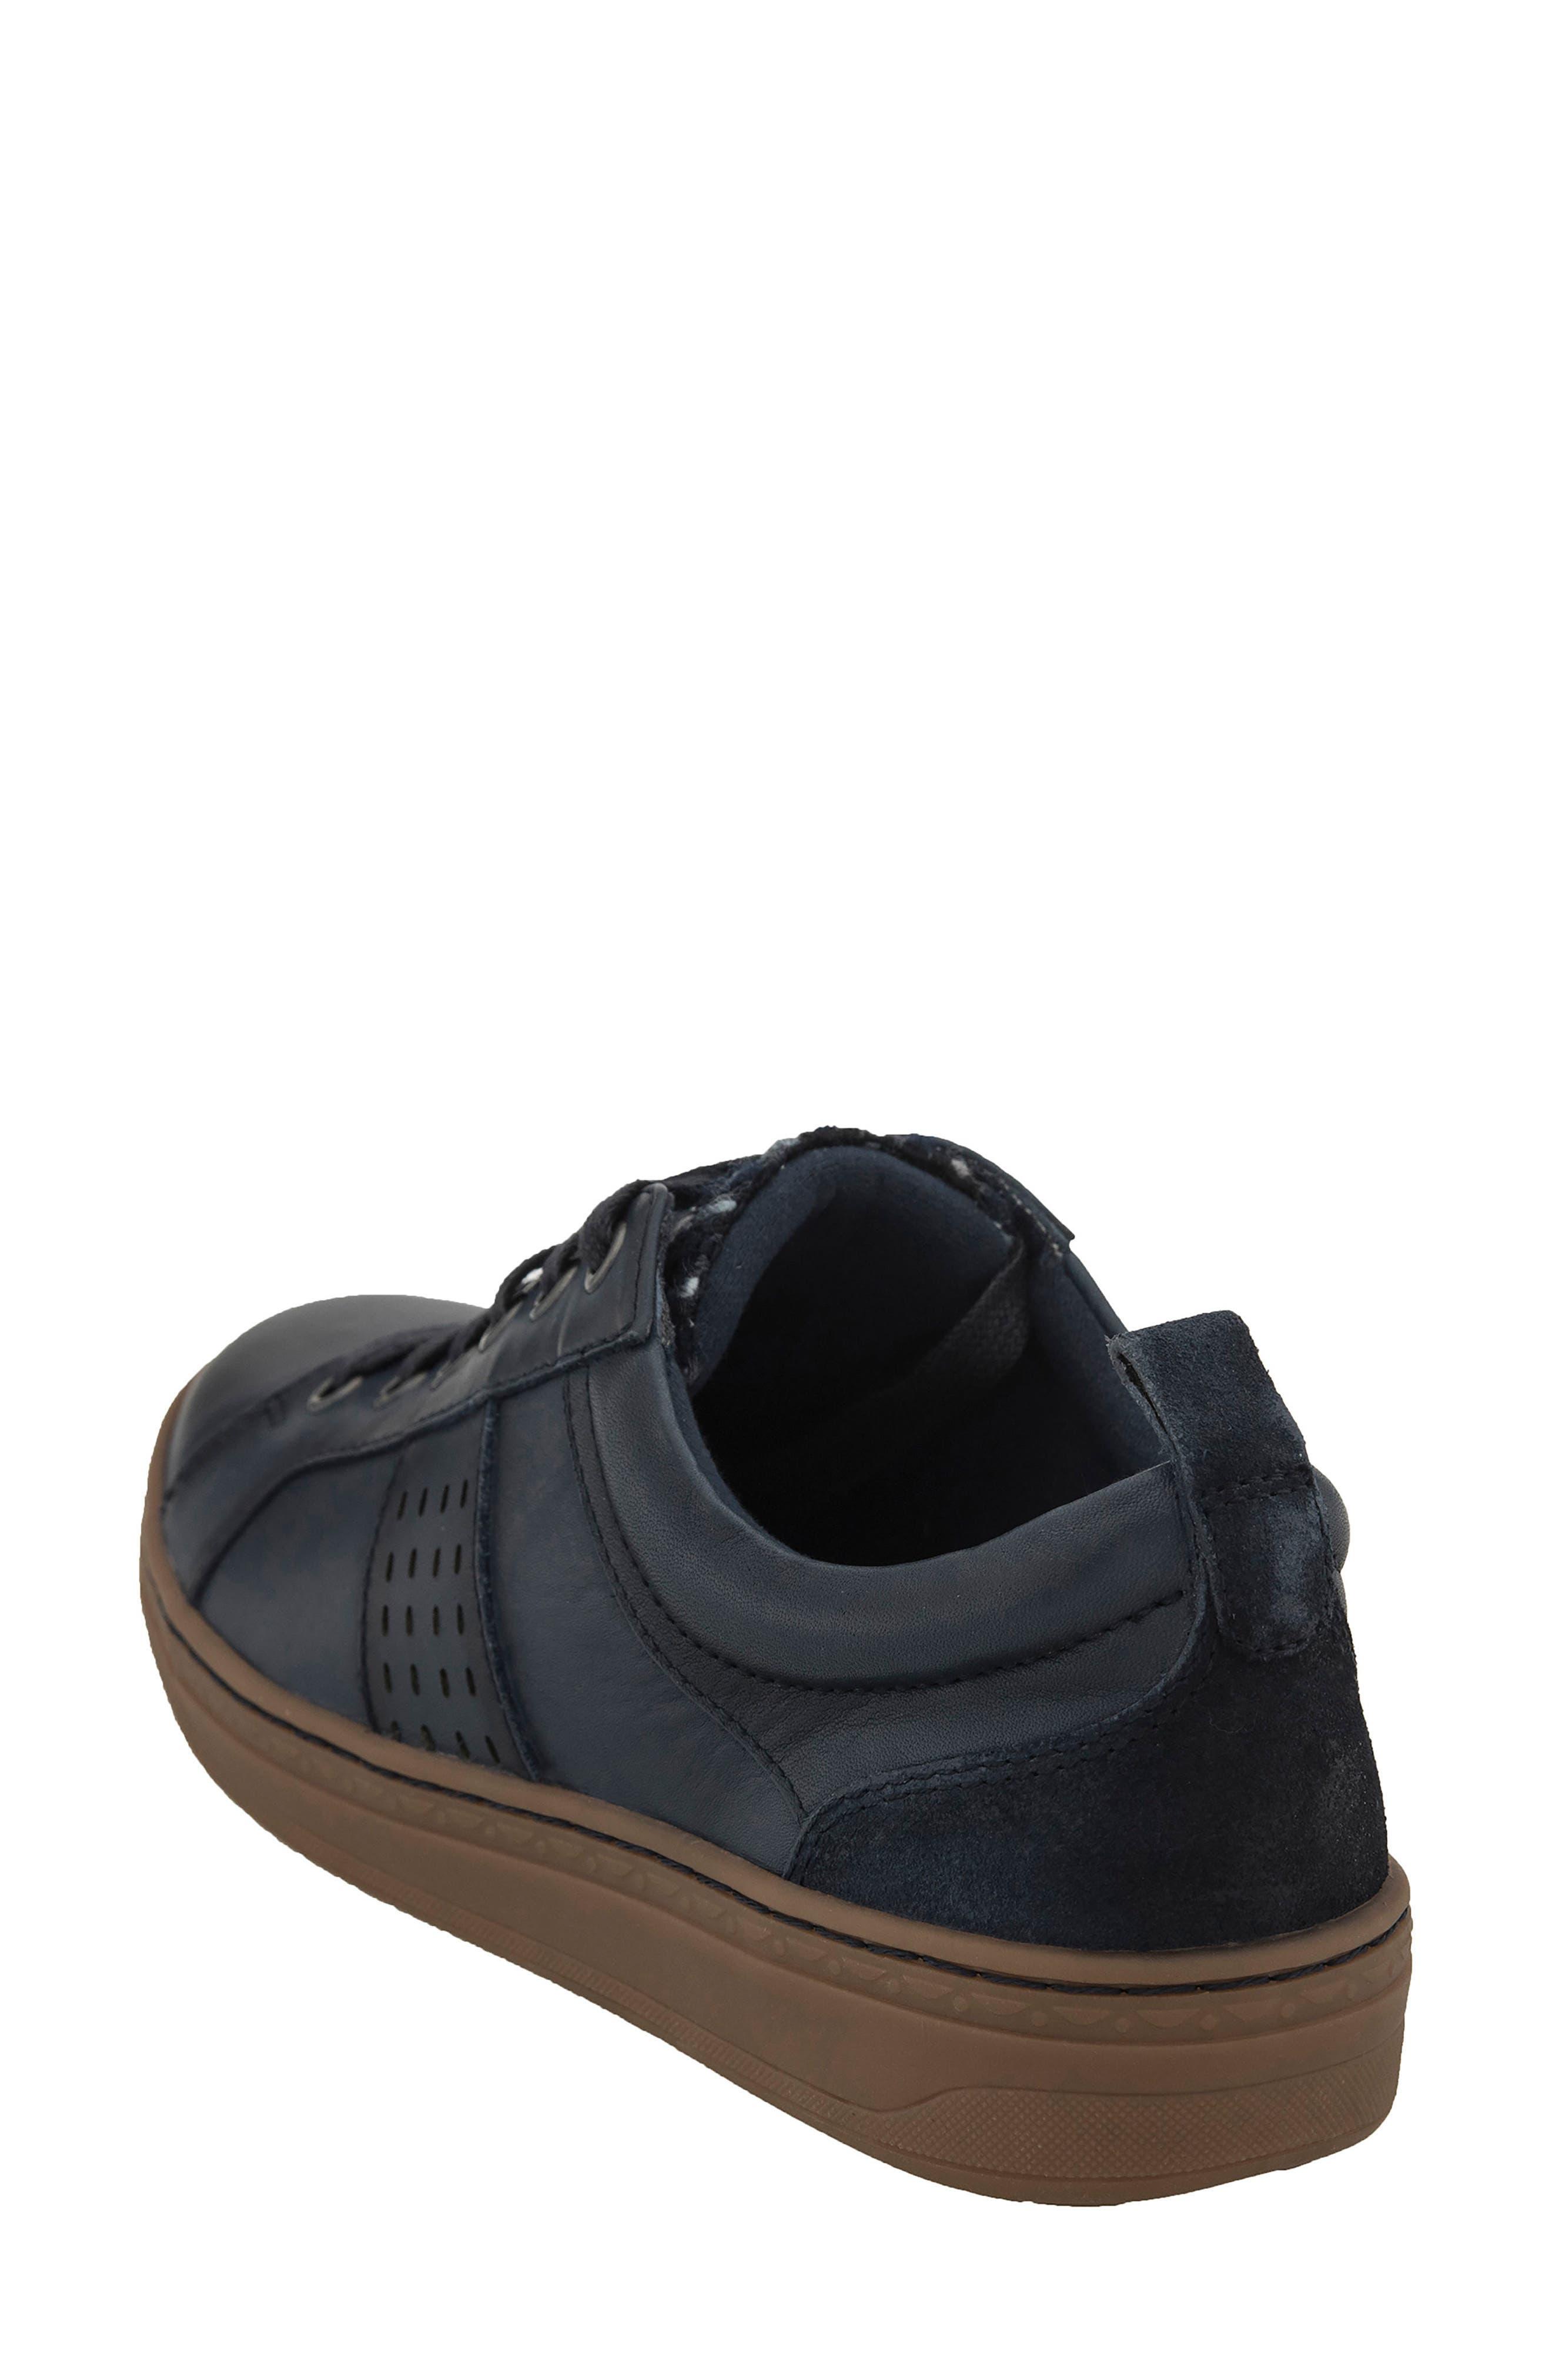 Zag Sneaker,                             Alternate thumbnail 14, color,